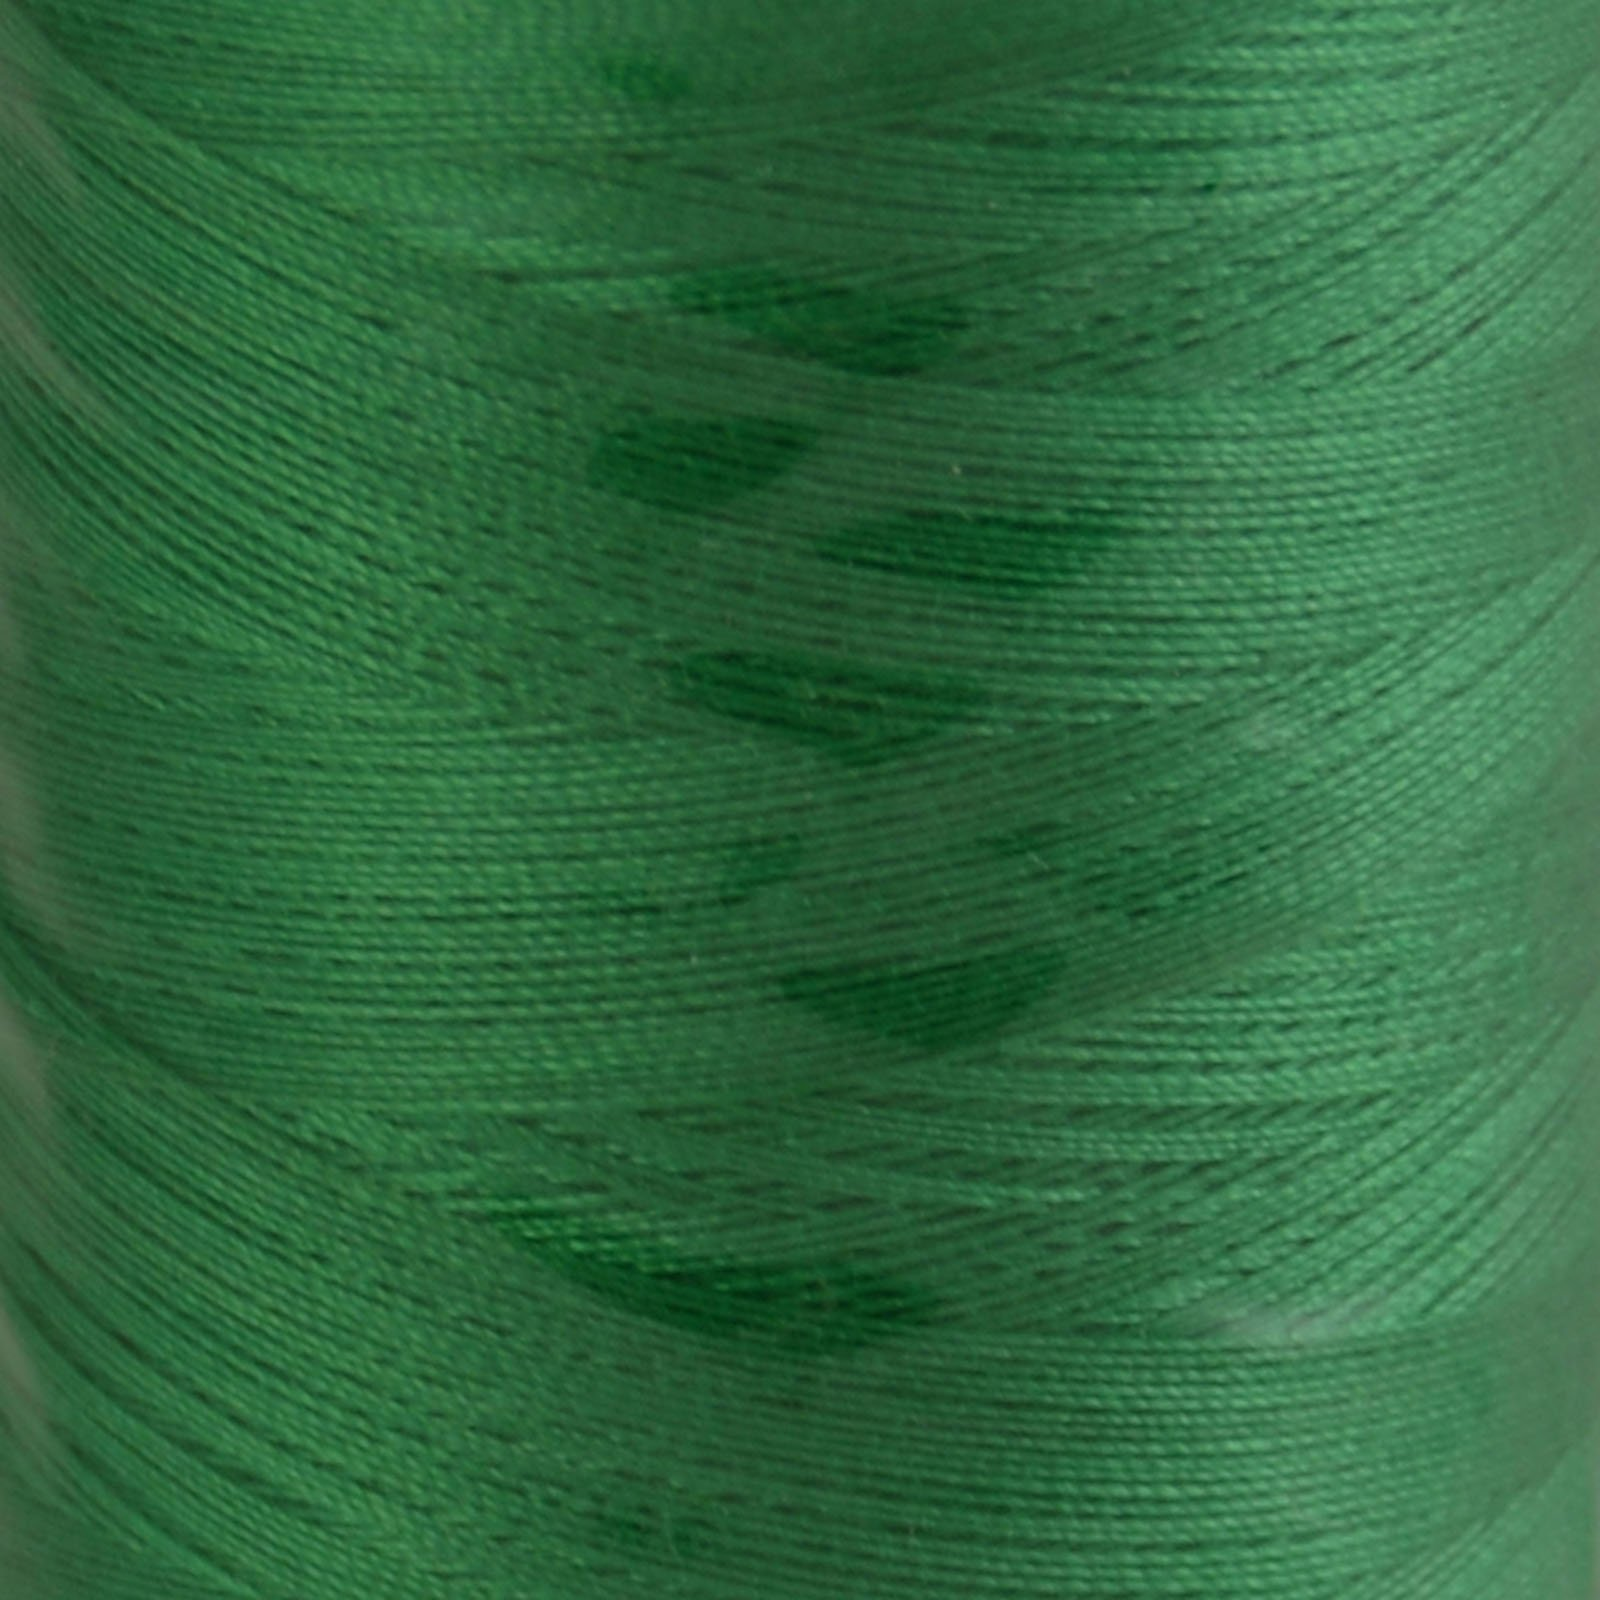 # 2865 Emerald